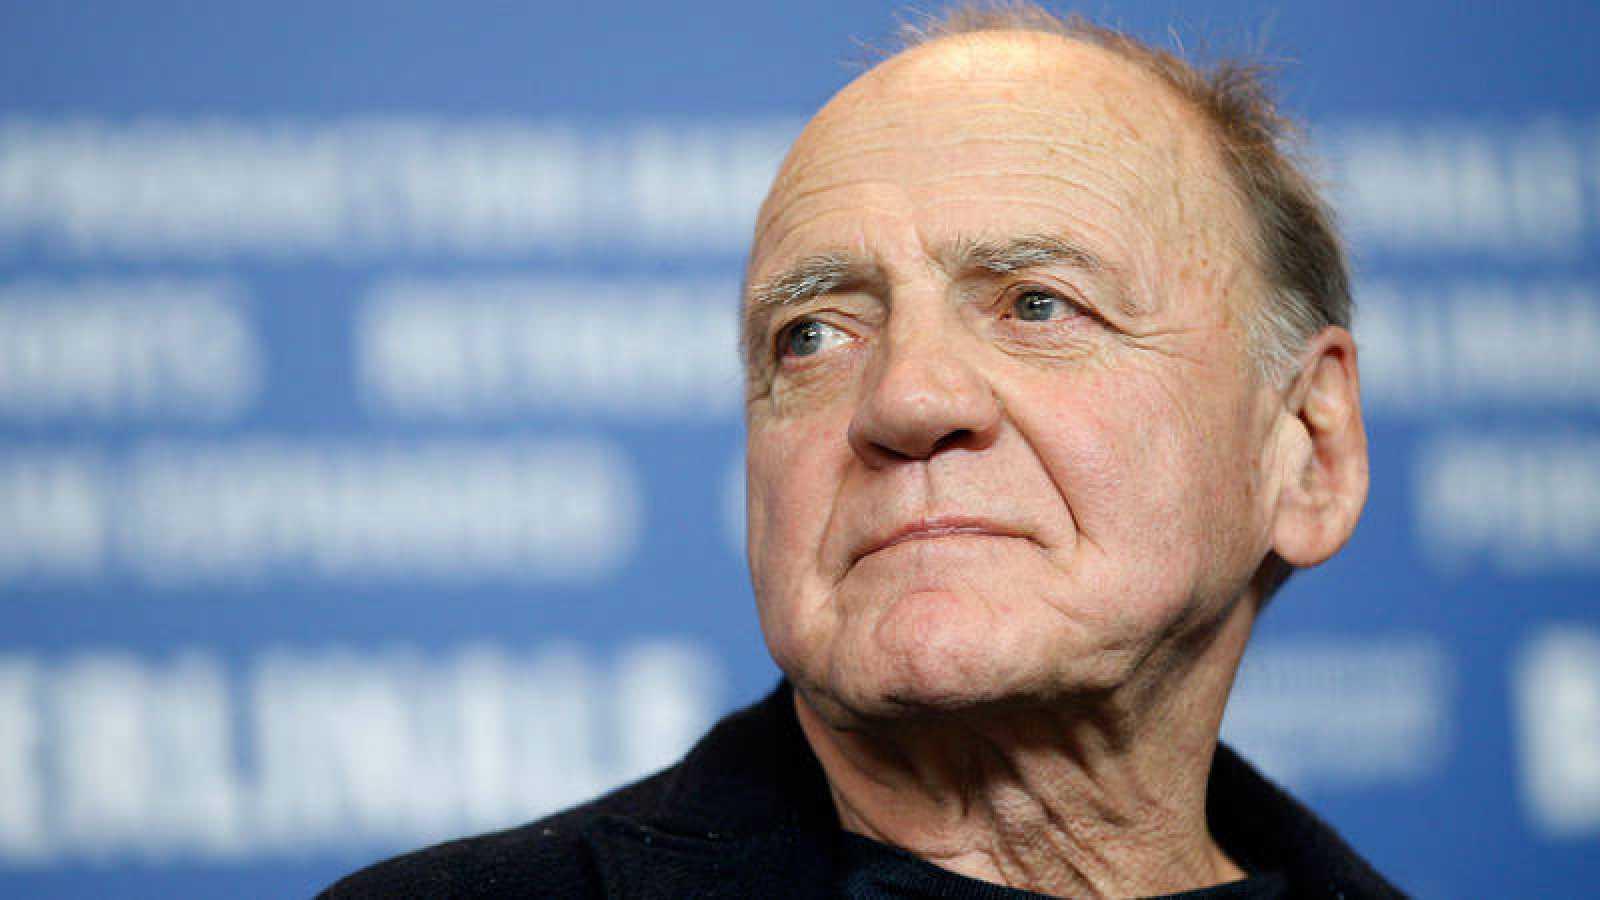 Muere Bruno Ganz, quien interpretó a Hitler en